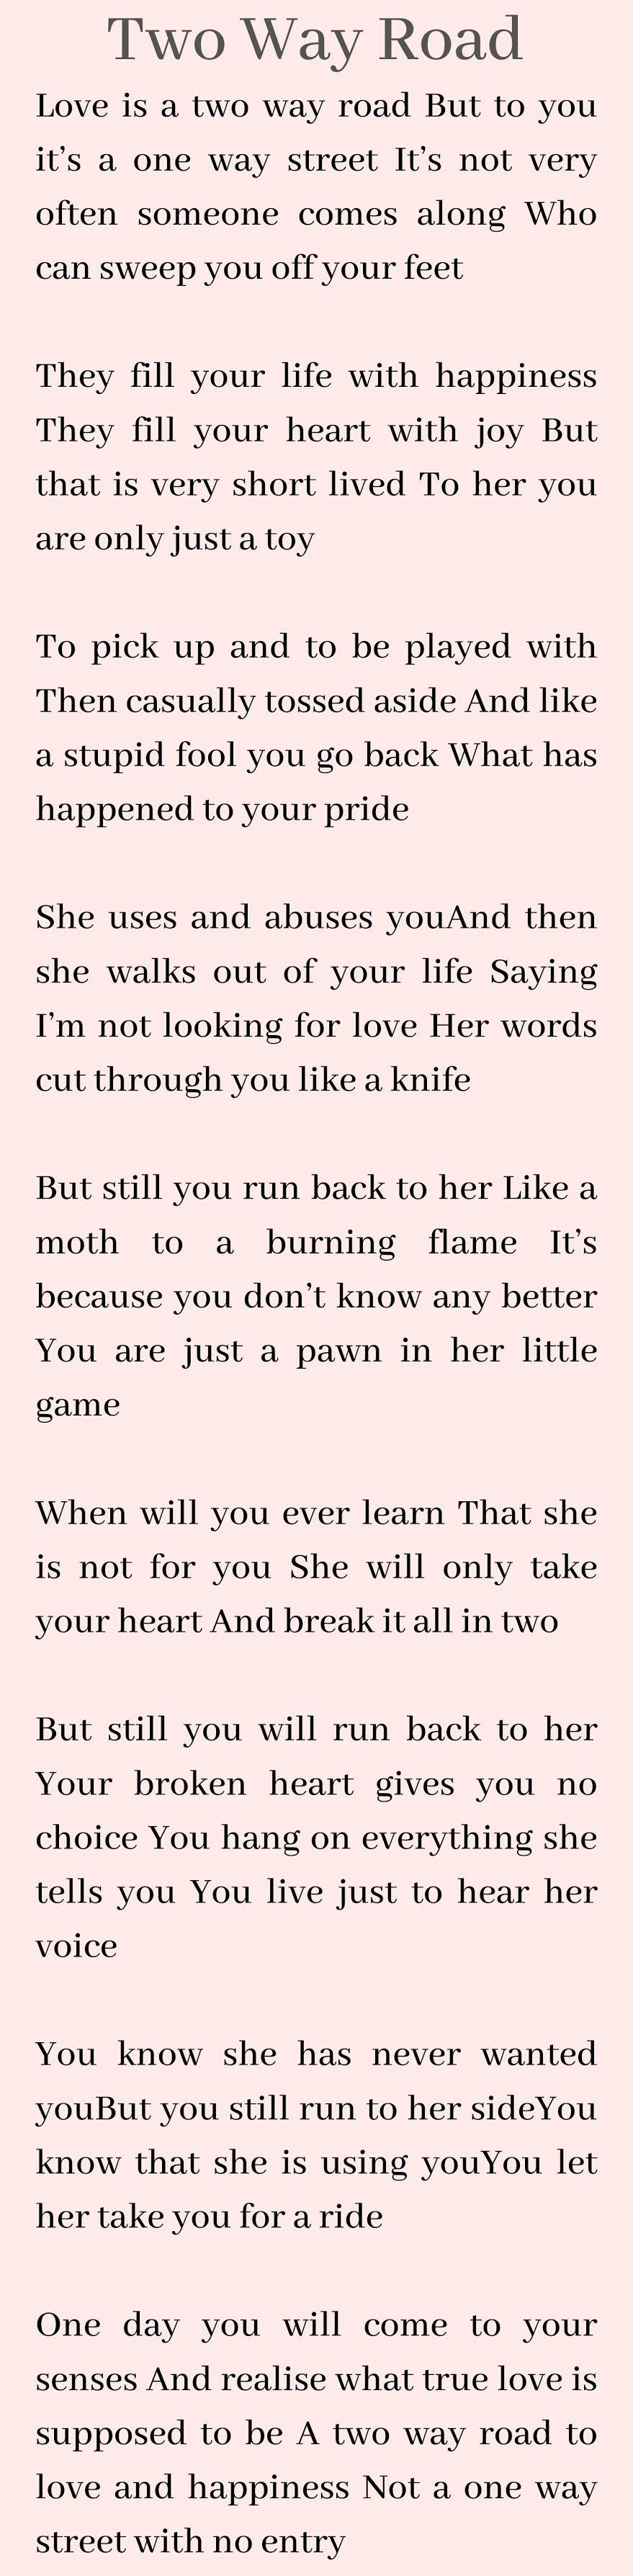 english love poem